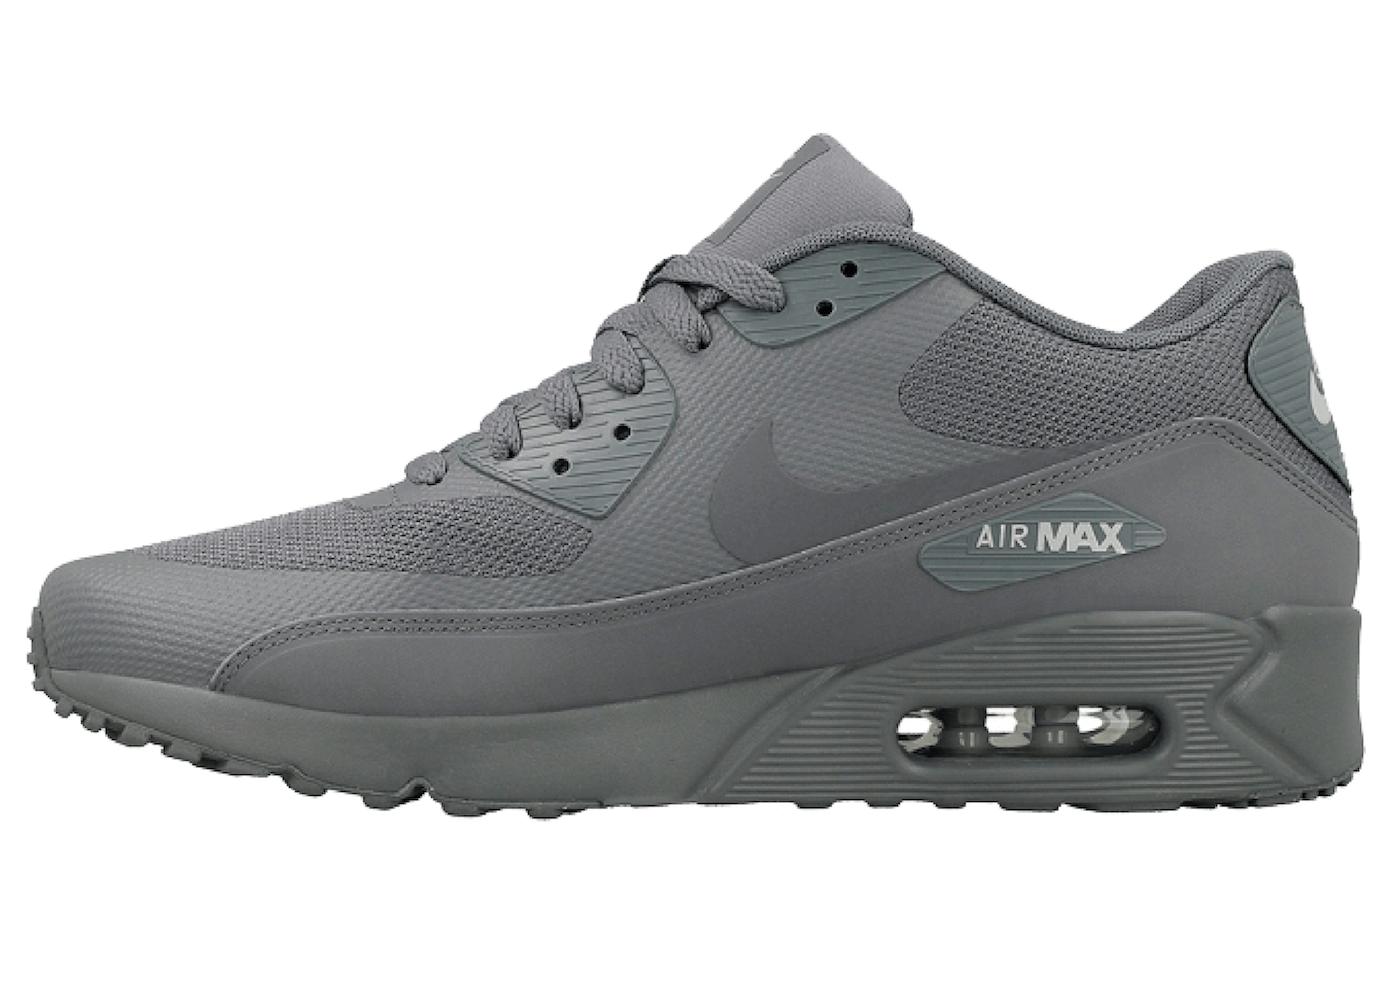 Air Max 90 Ultra 2.0 Cool Greyの写真